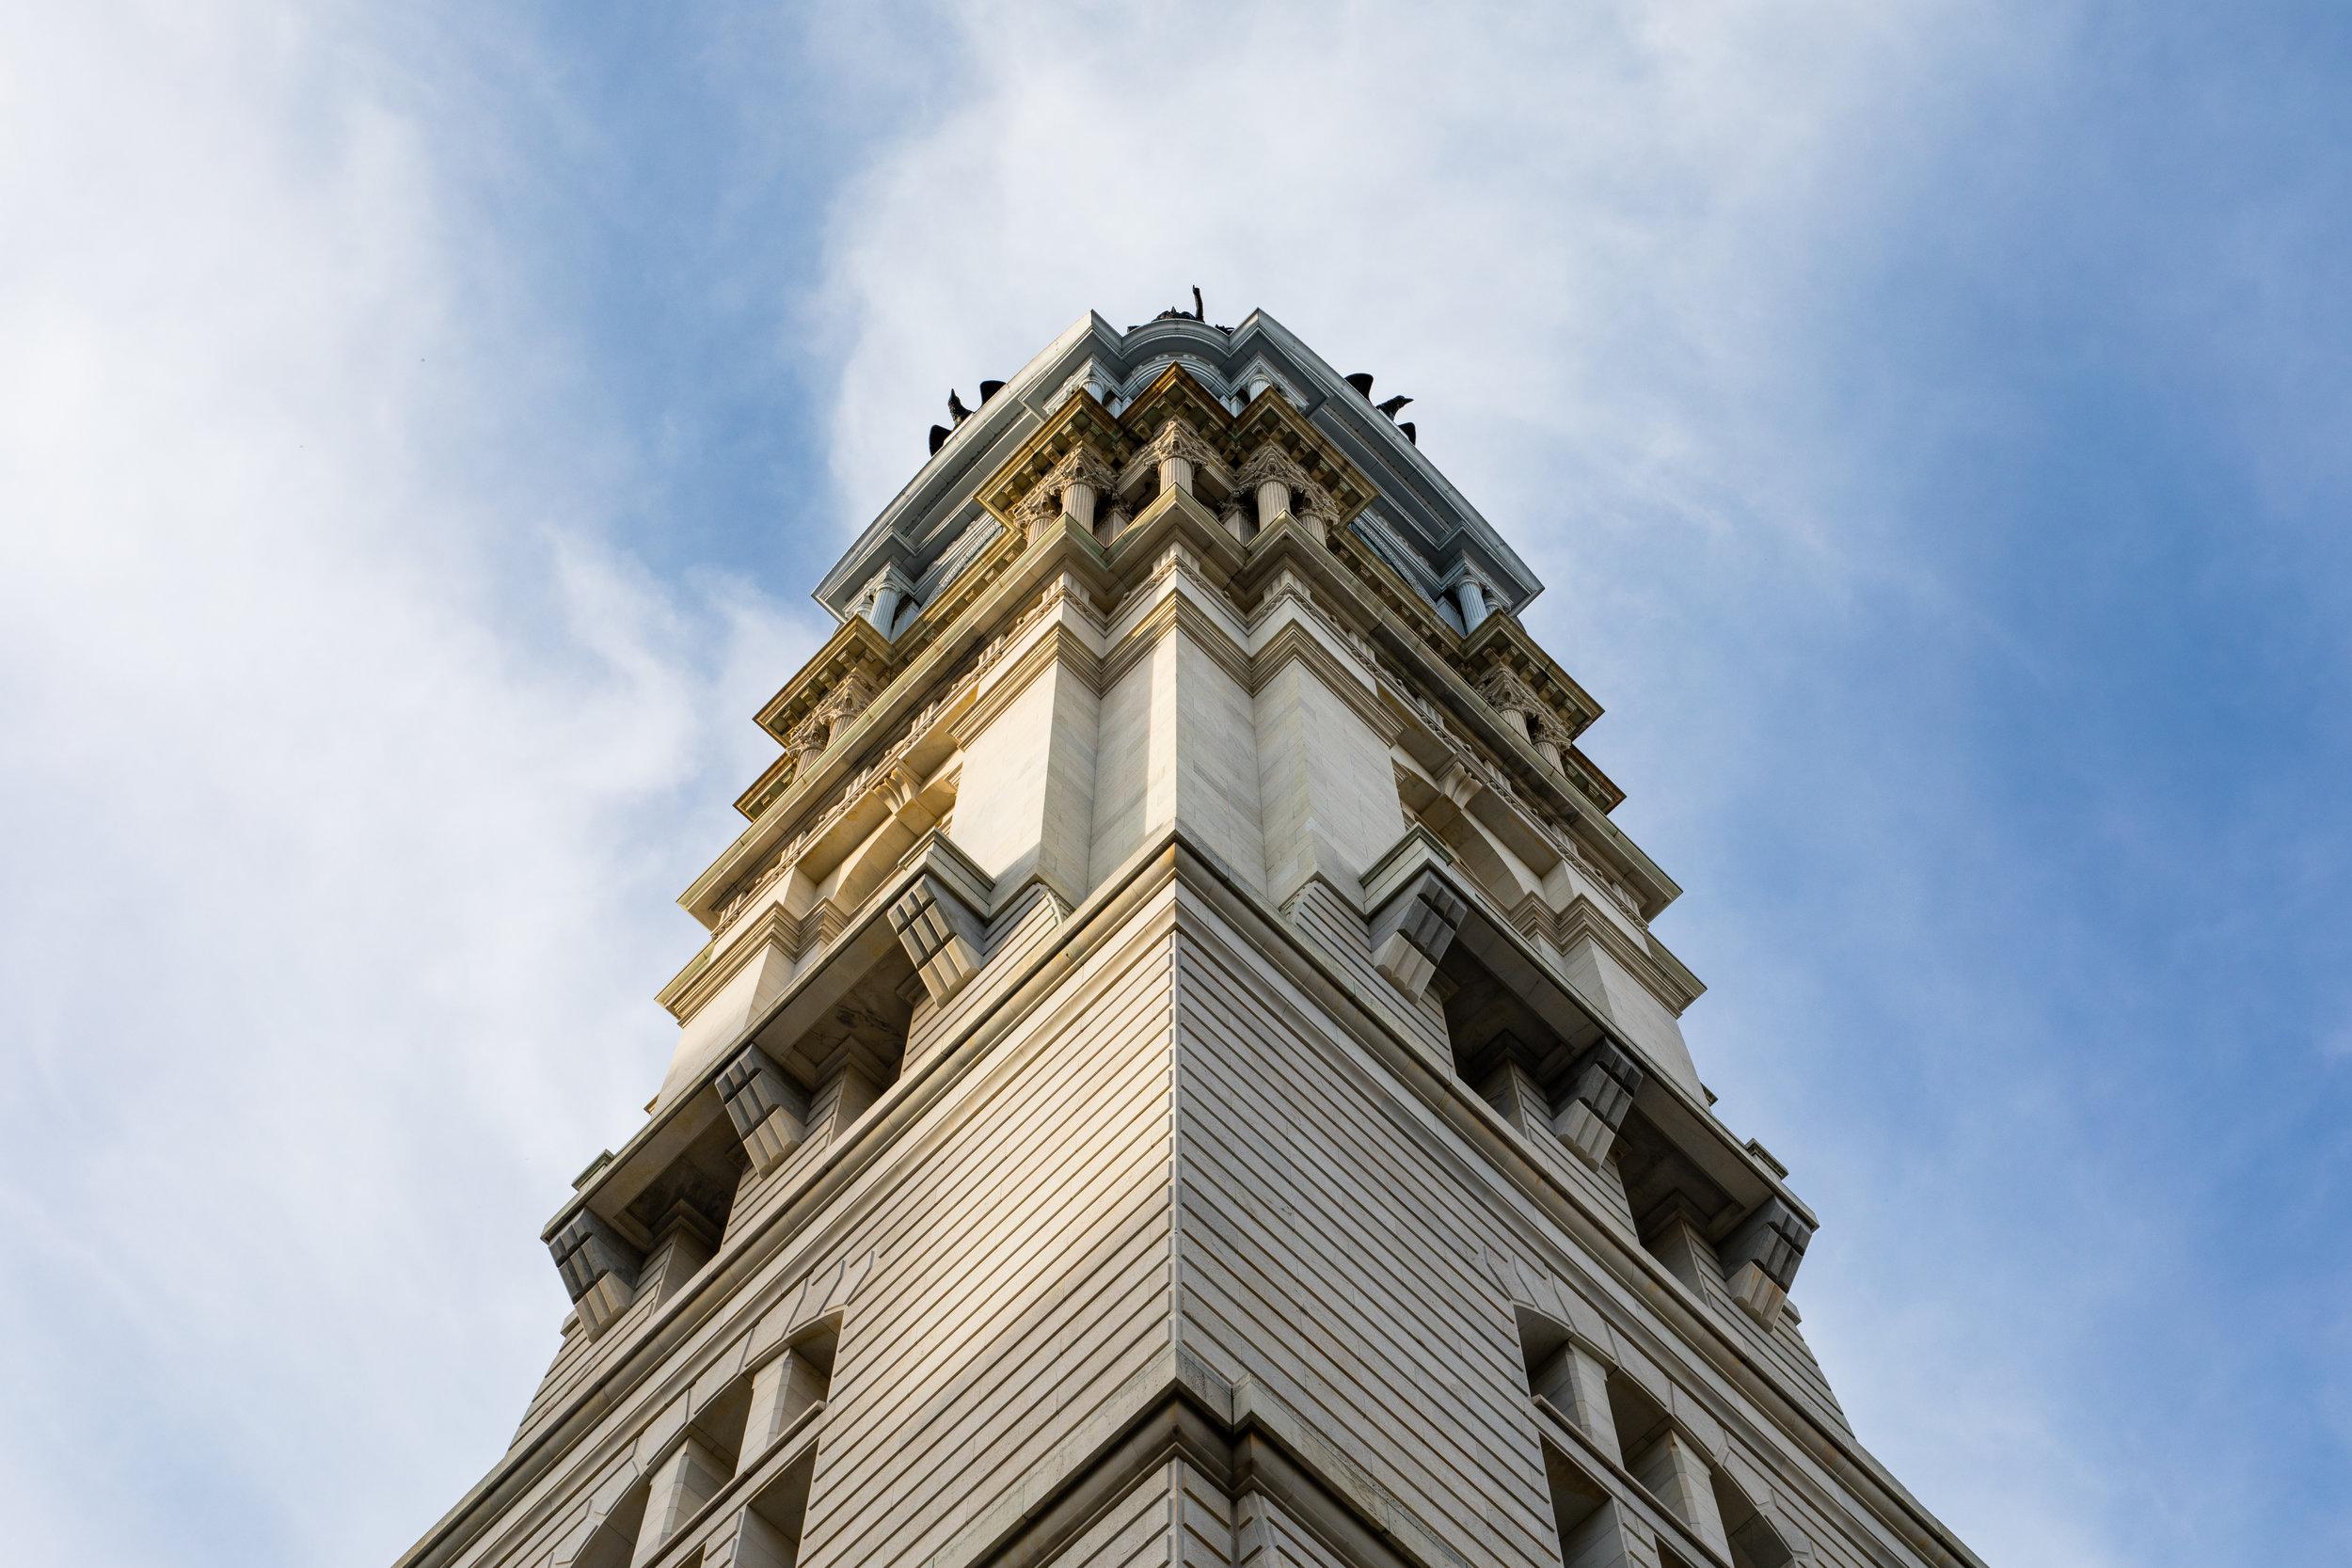 Angles-of-Philly-City-Hall-Philadelphia-Pennsylvannia.jpg